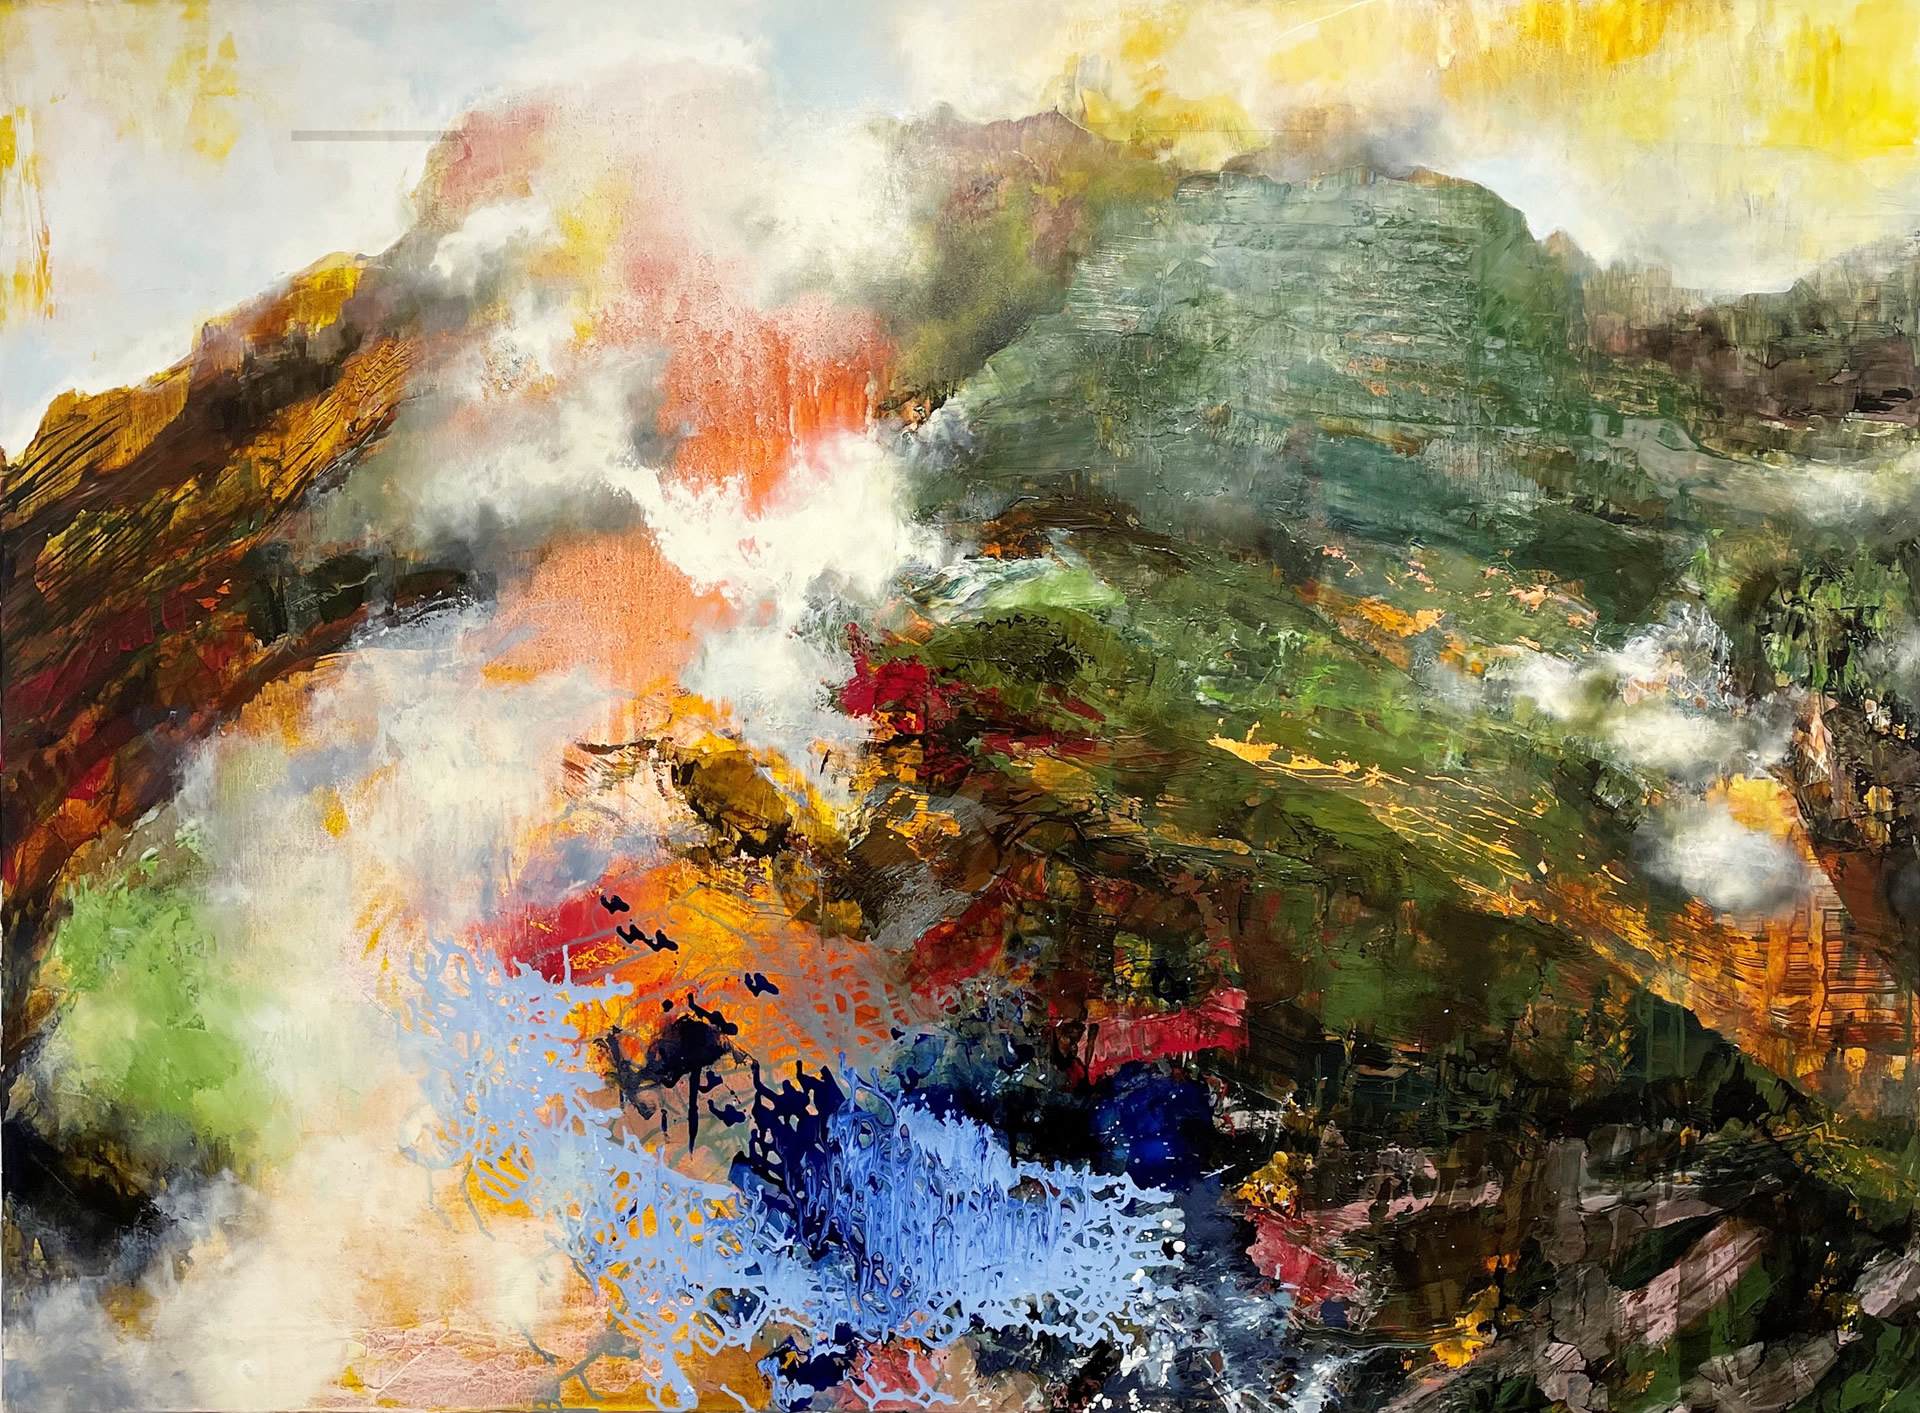 Kentree-Speirs-Breath-2018-Oil-On-Panel-36x48-4900-Online-Art-Galleries